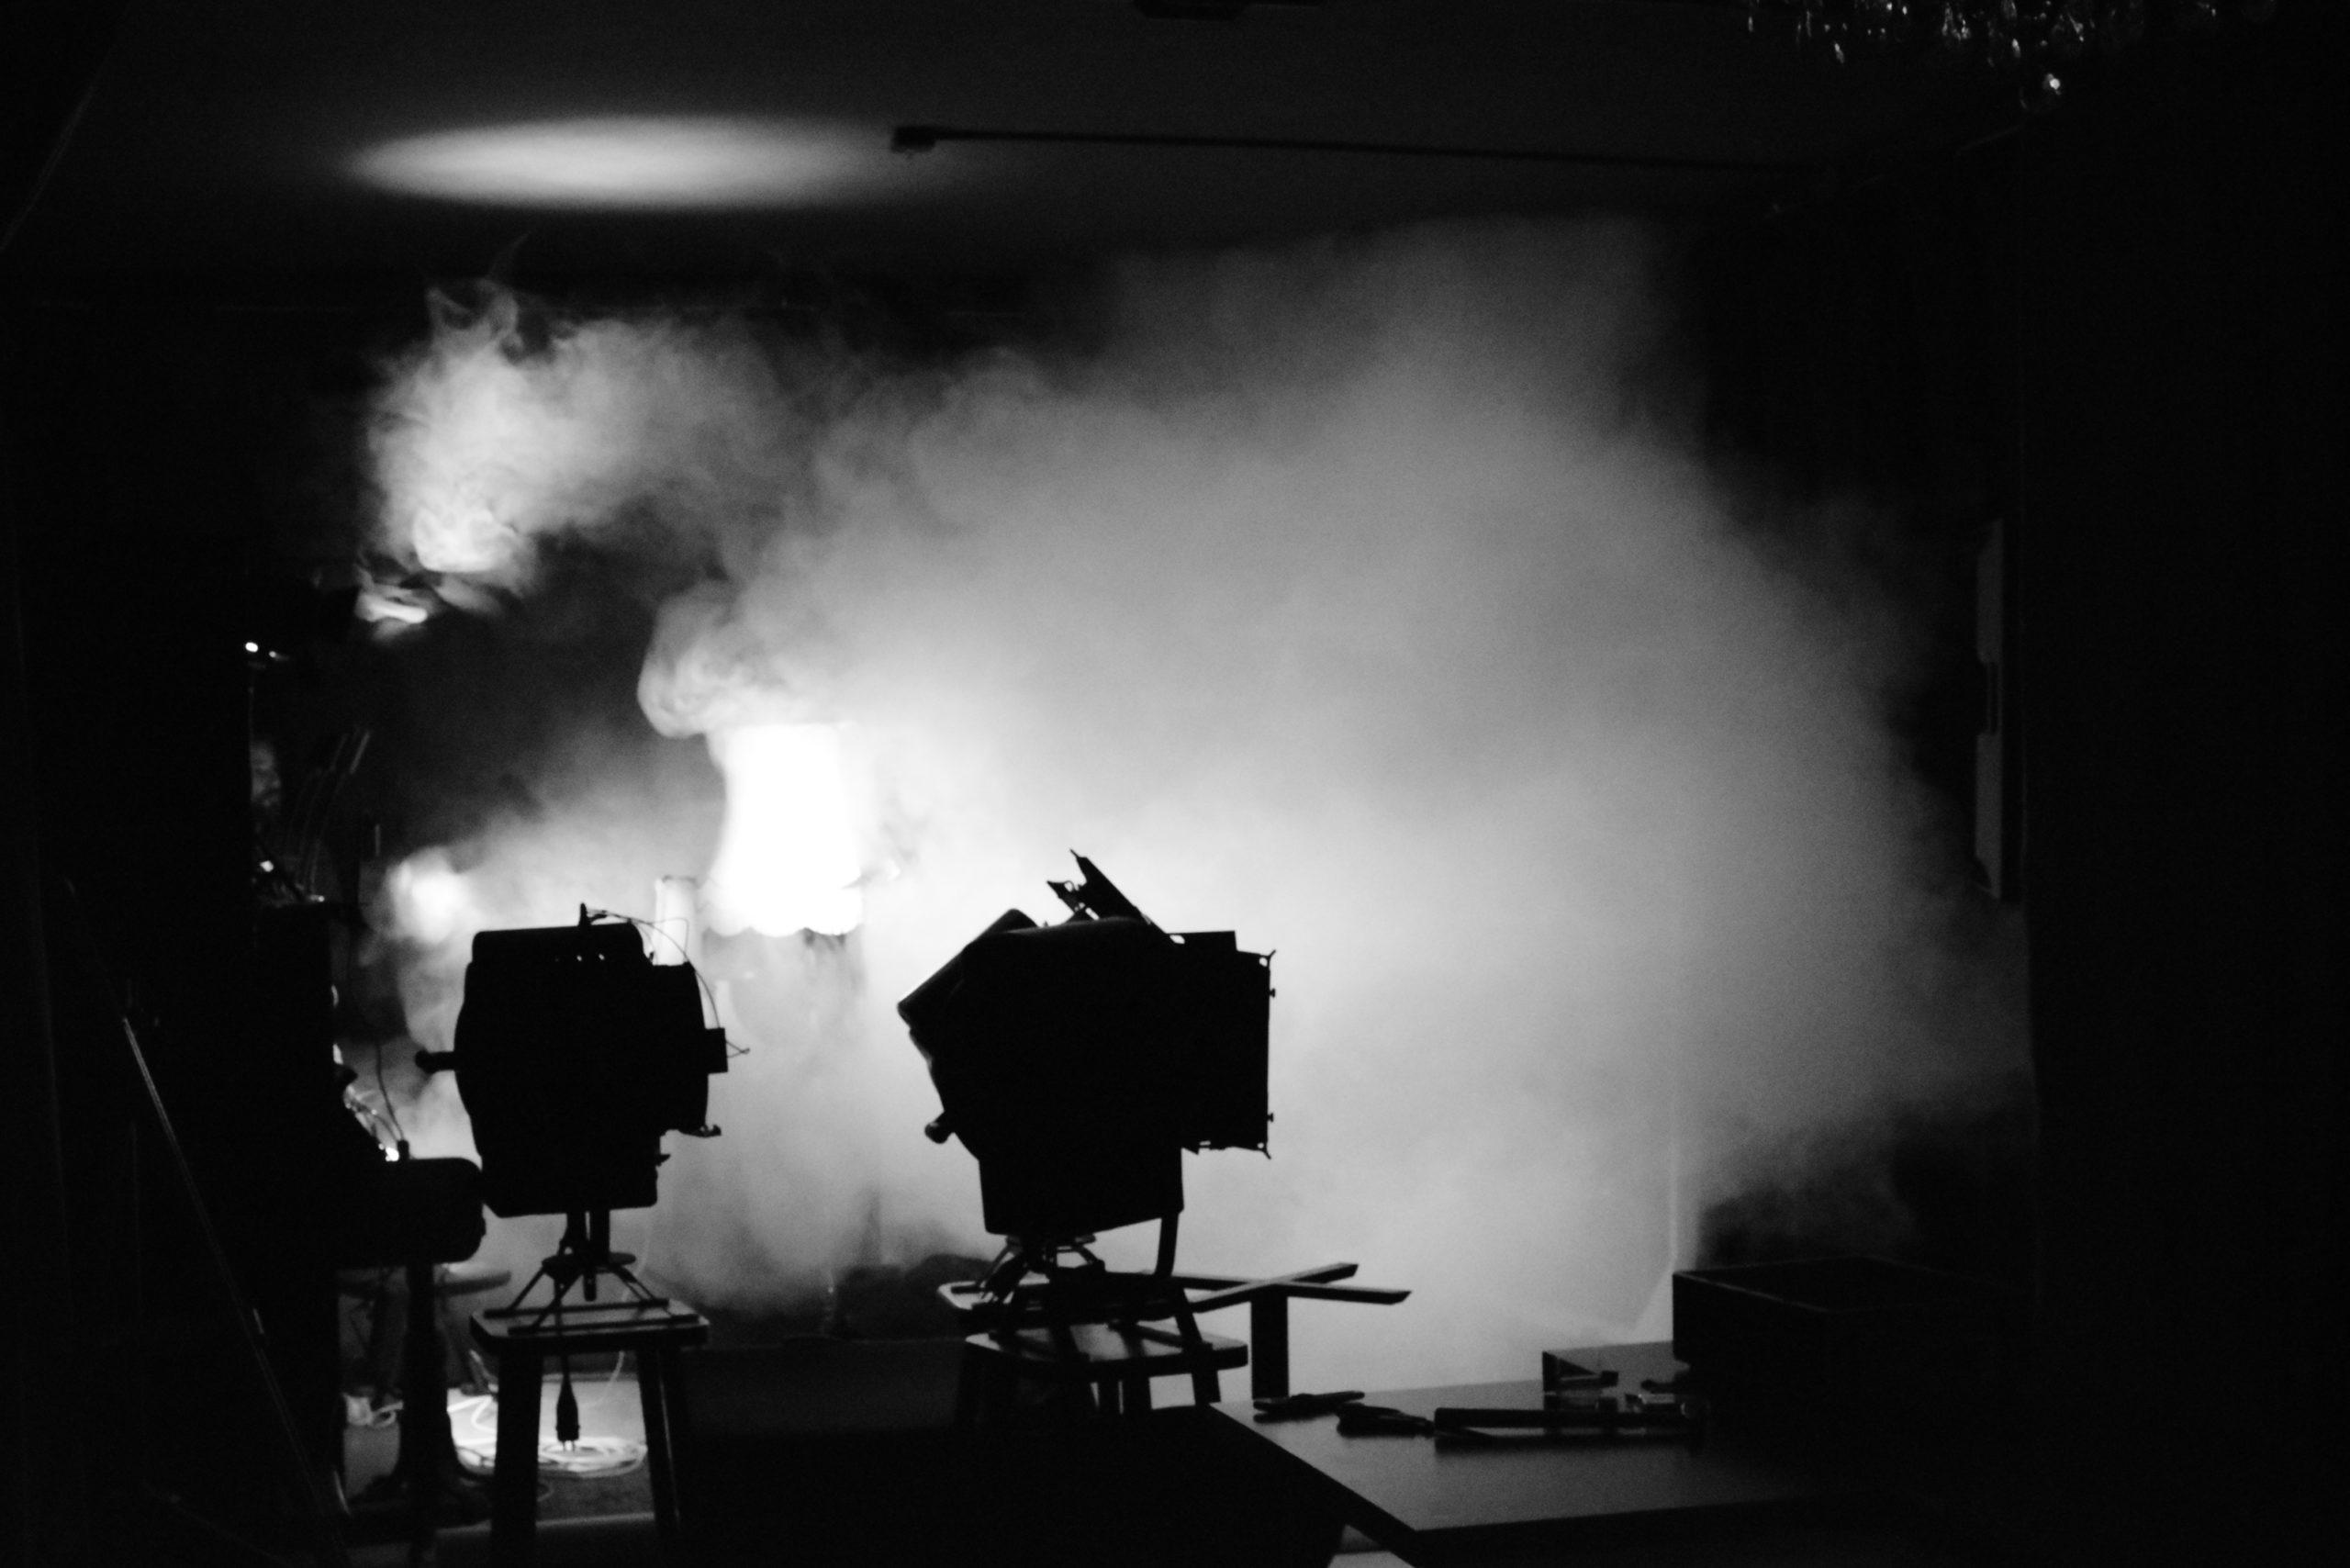 KNH-Darkroom#5